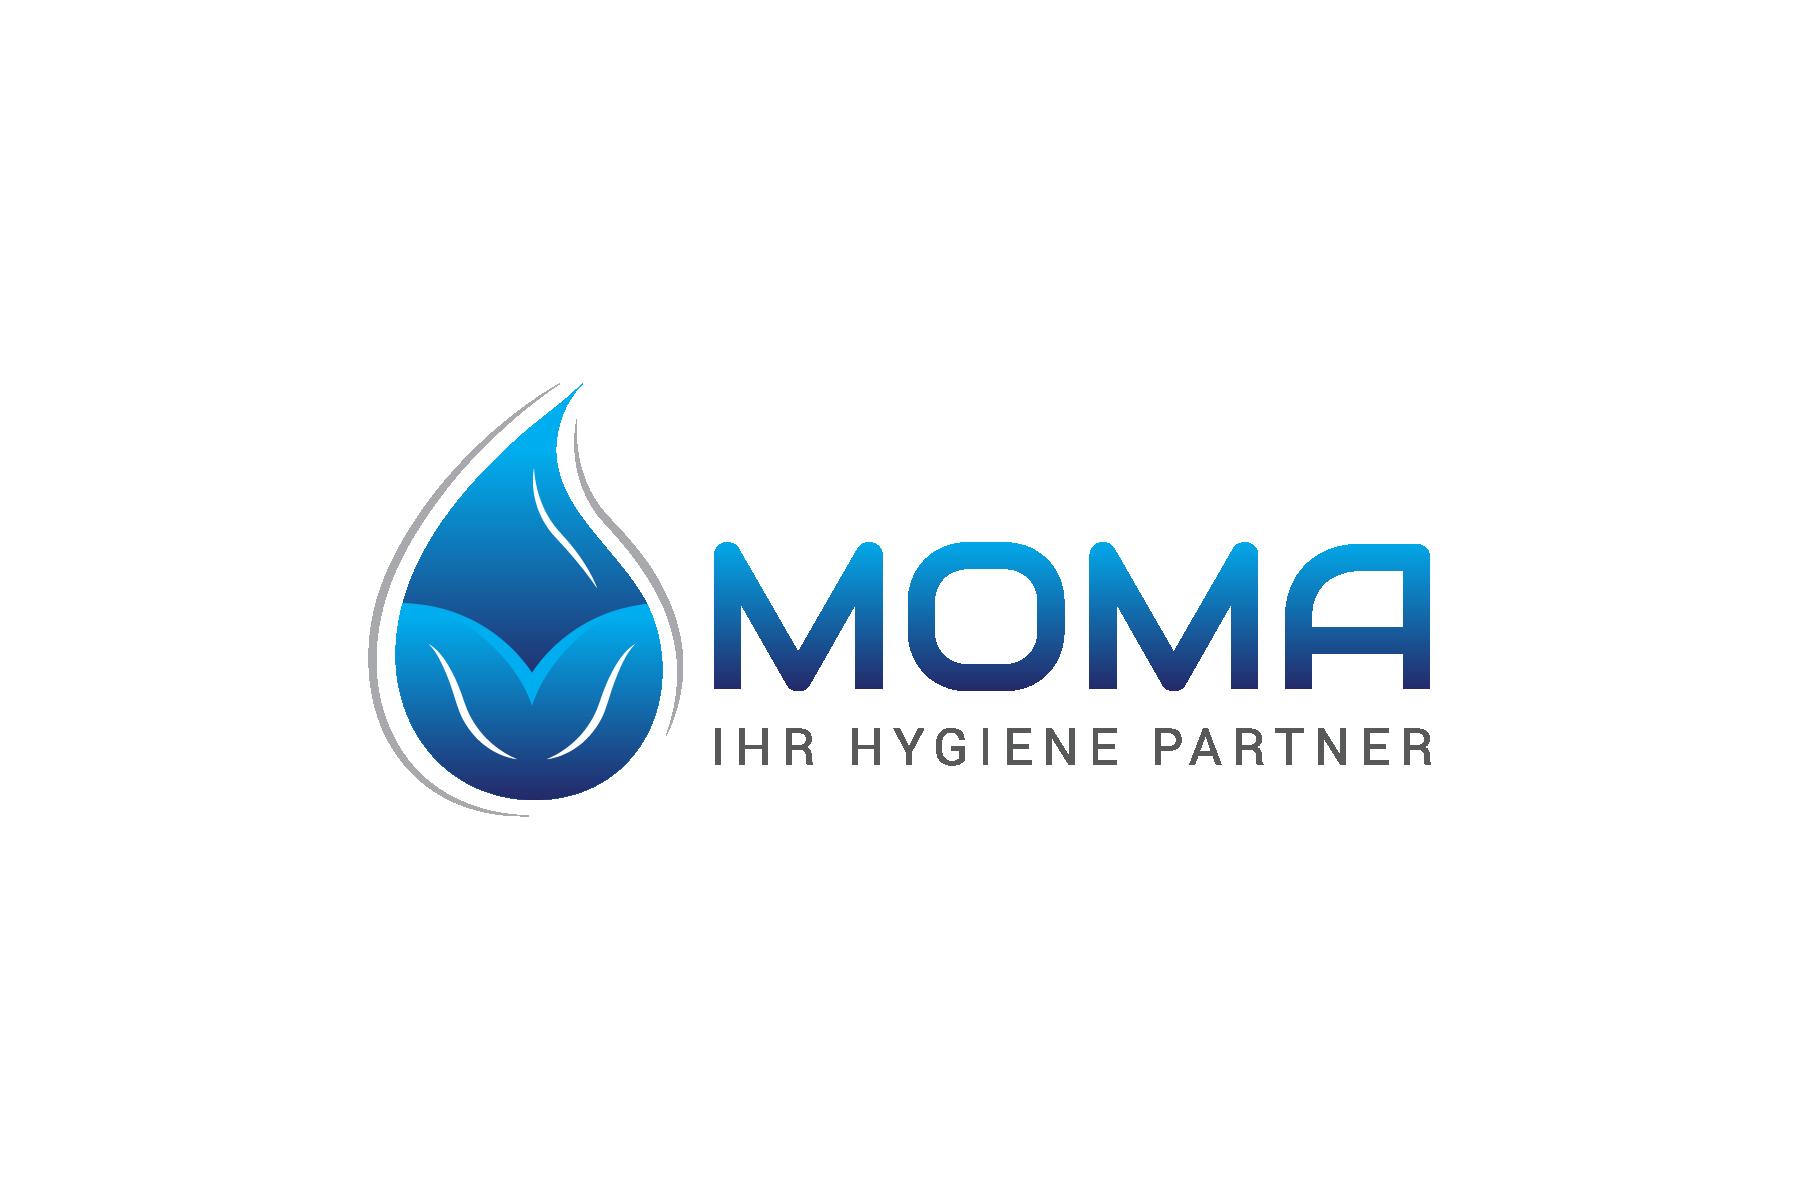 Moma GmbH